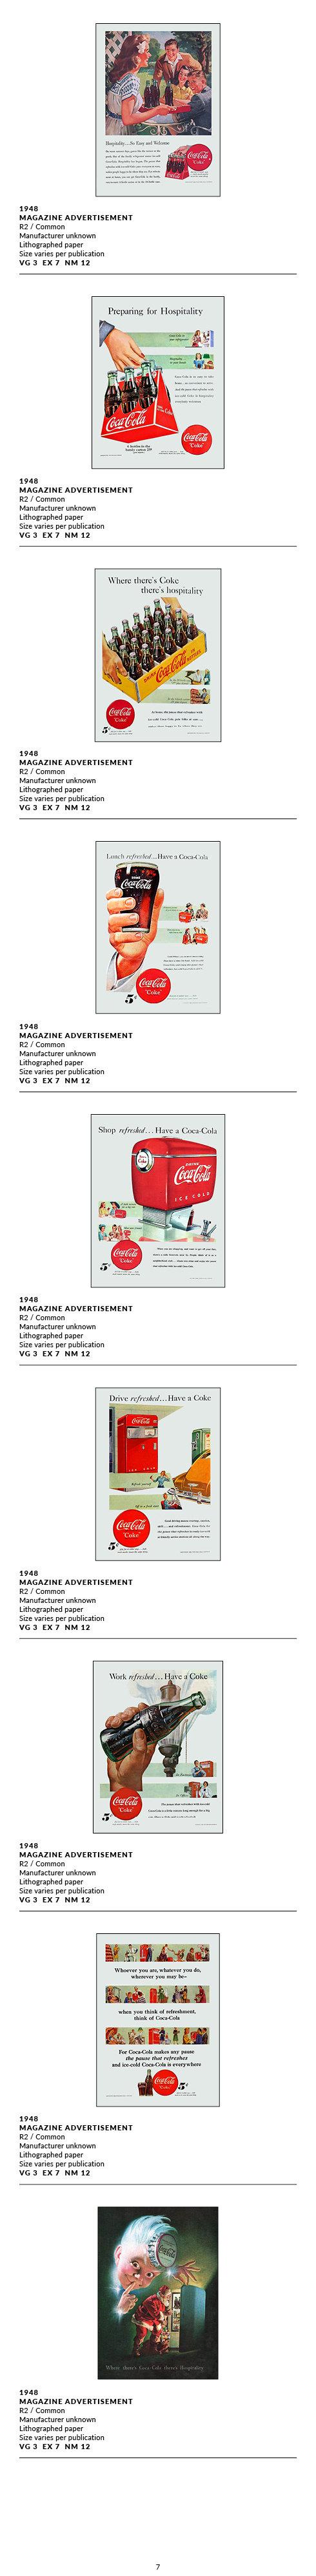 Desktop 1940-49 Ads_7.jpg